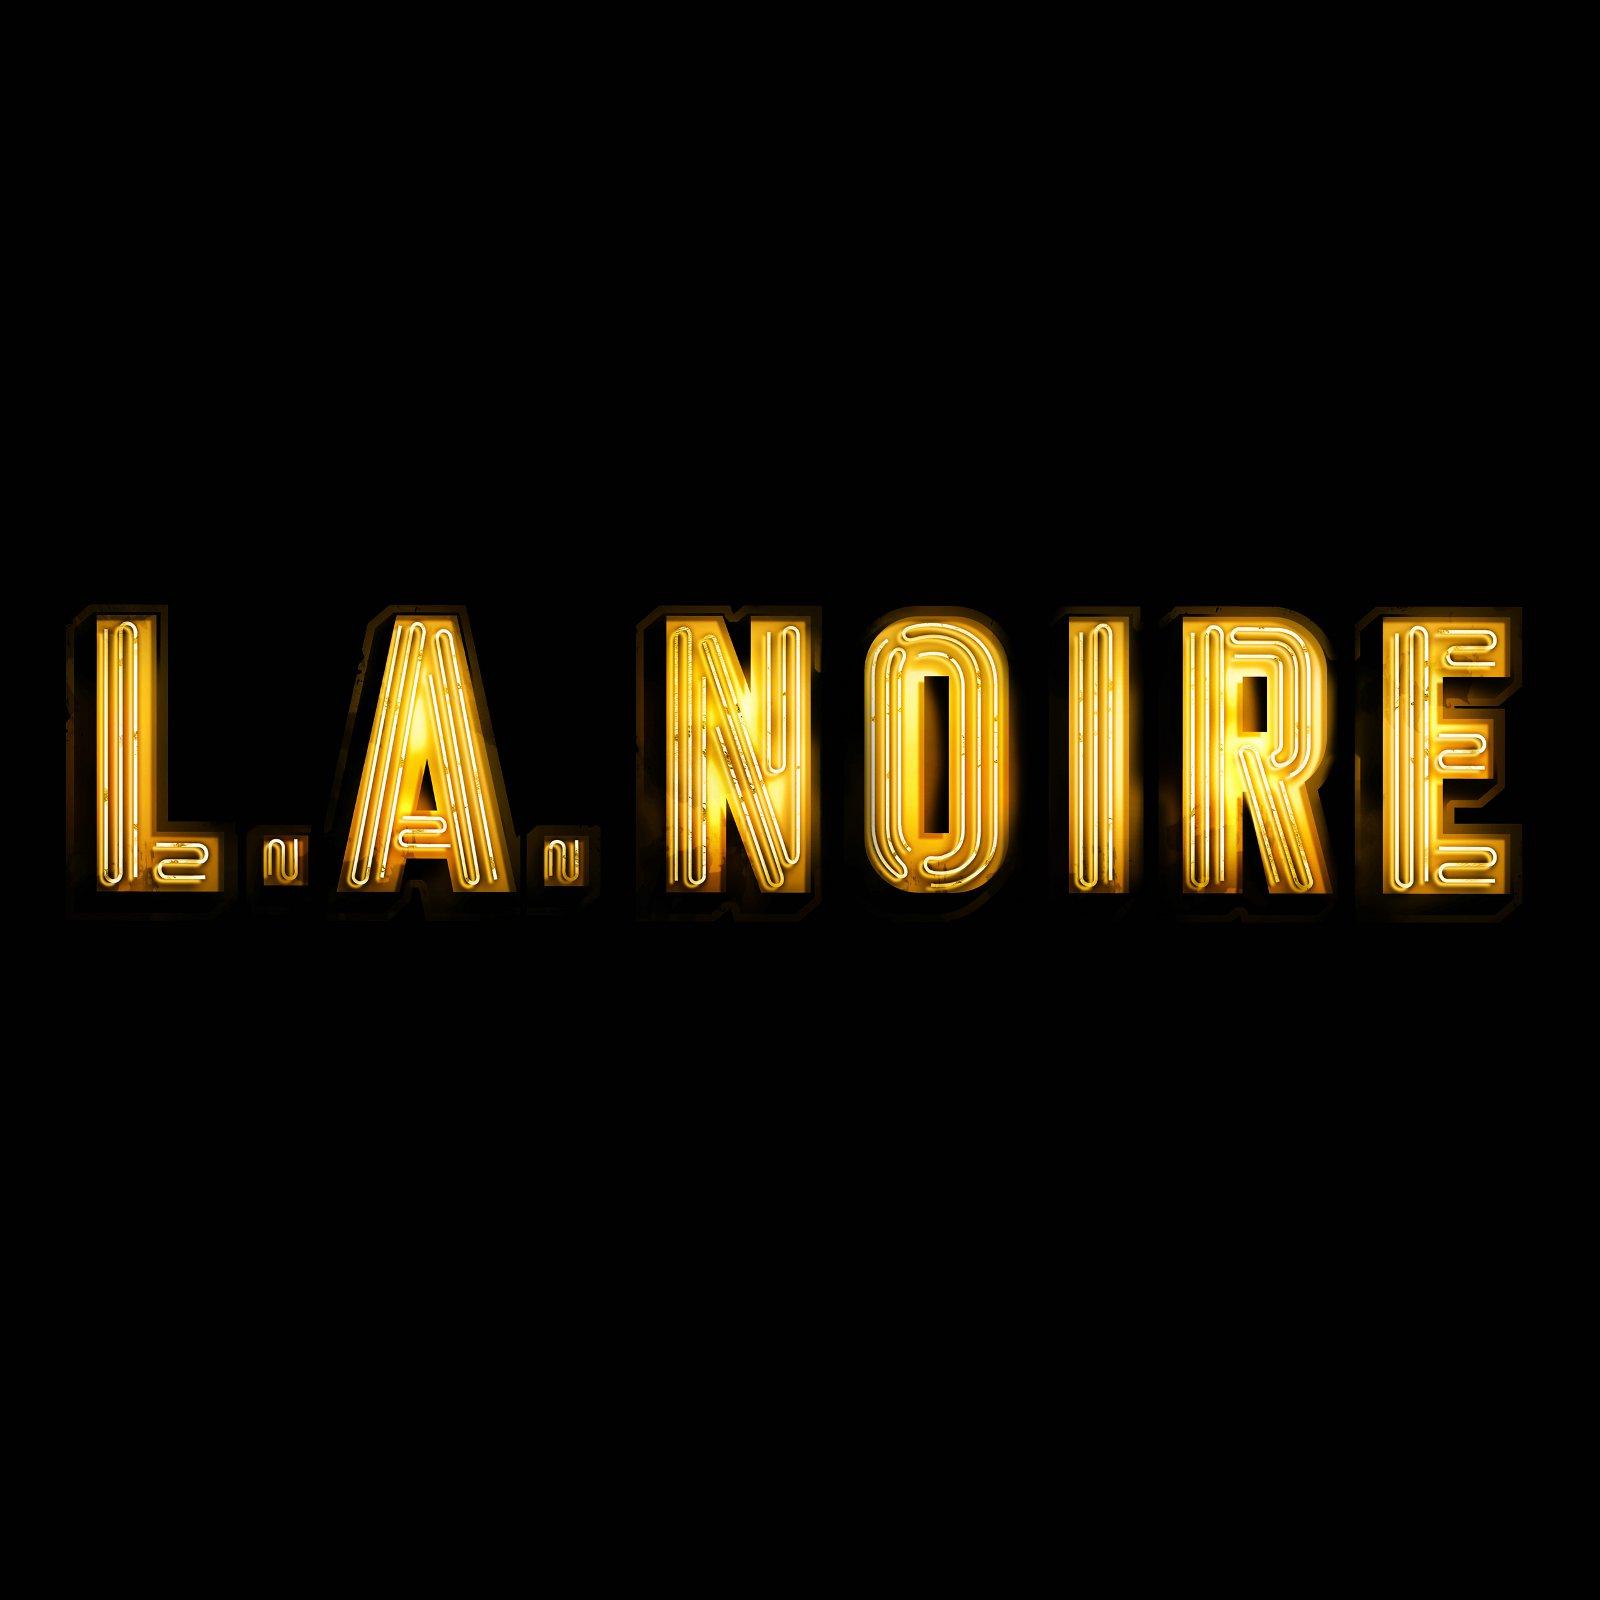 <em>L.A. Noire</em> Honored as Official Selection at 2011 Tribeca Film Festival